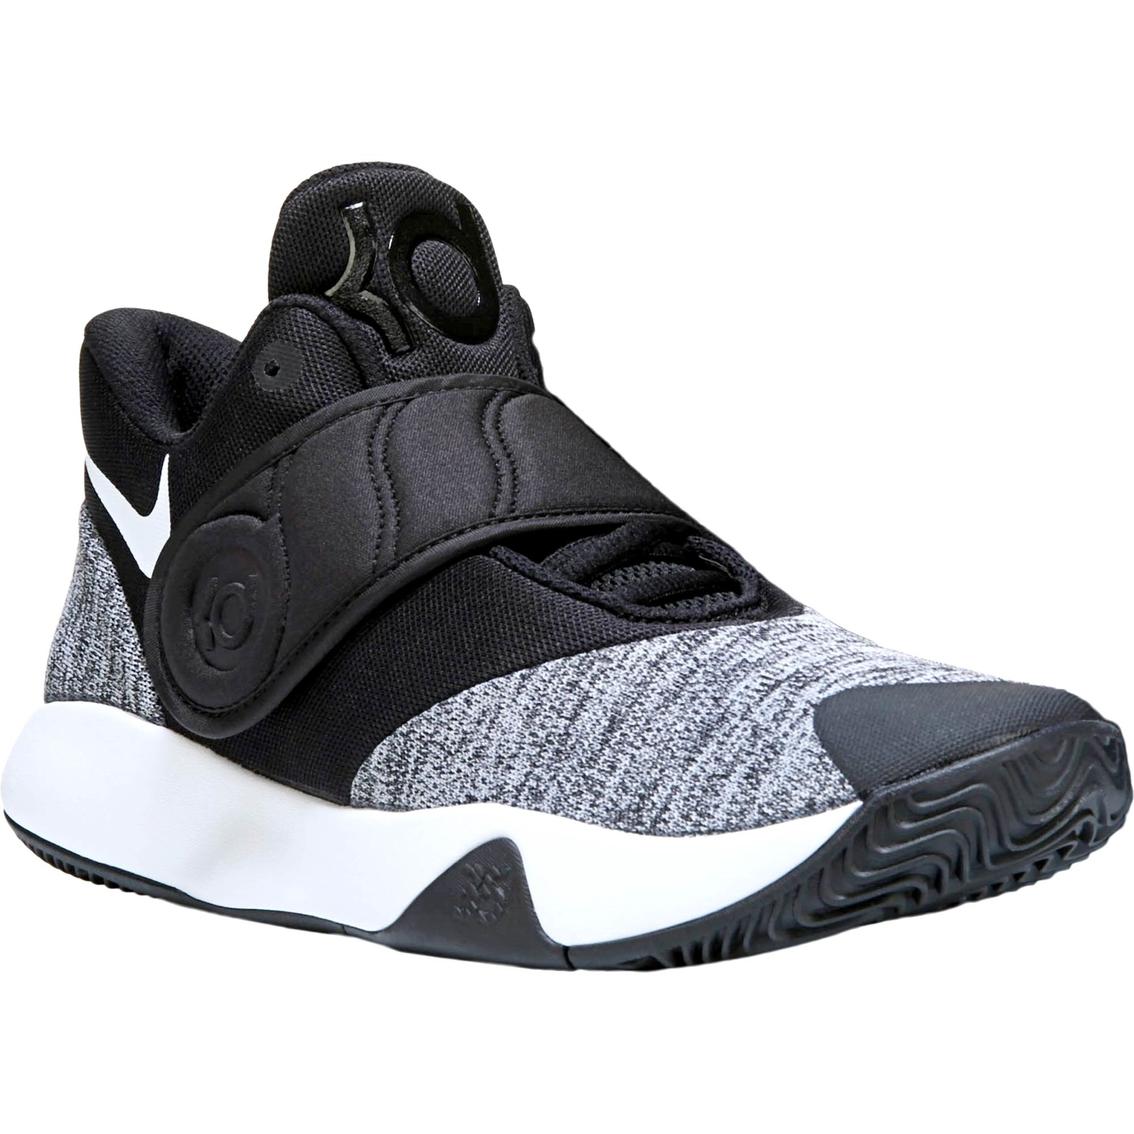 95ac67a852f Nike Men's Kd Trey 5 Vi Basketball Shoes | Basketball | Shoes | Shop ...